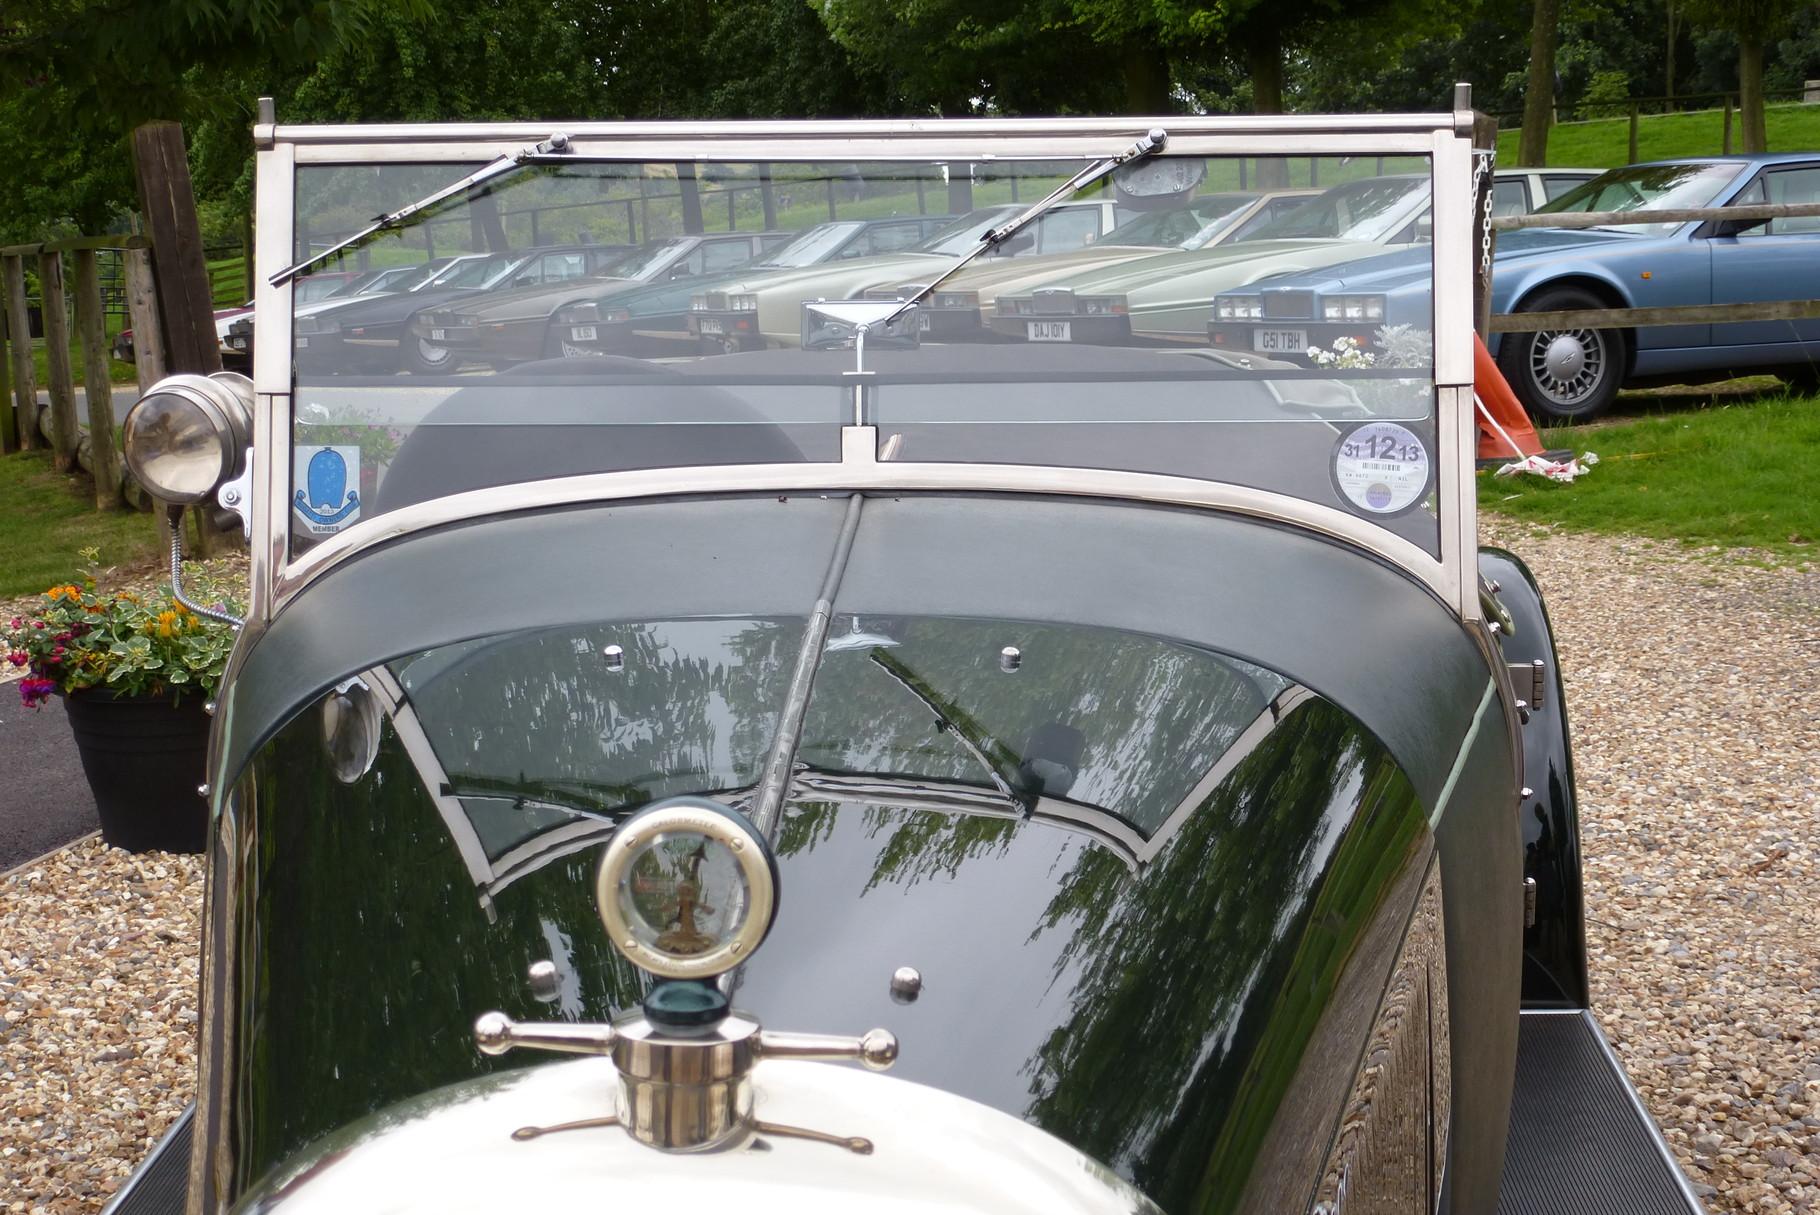 2013 LagondaFest in England